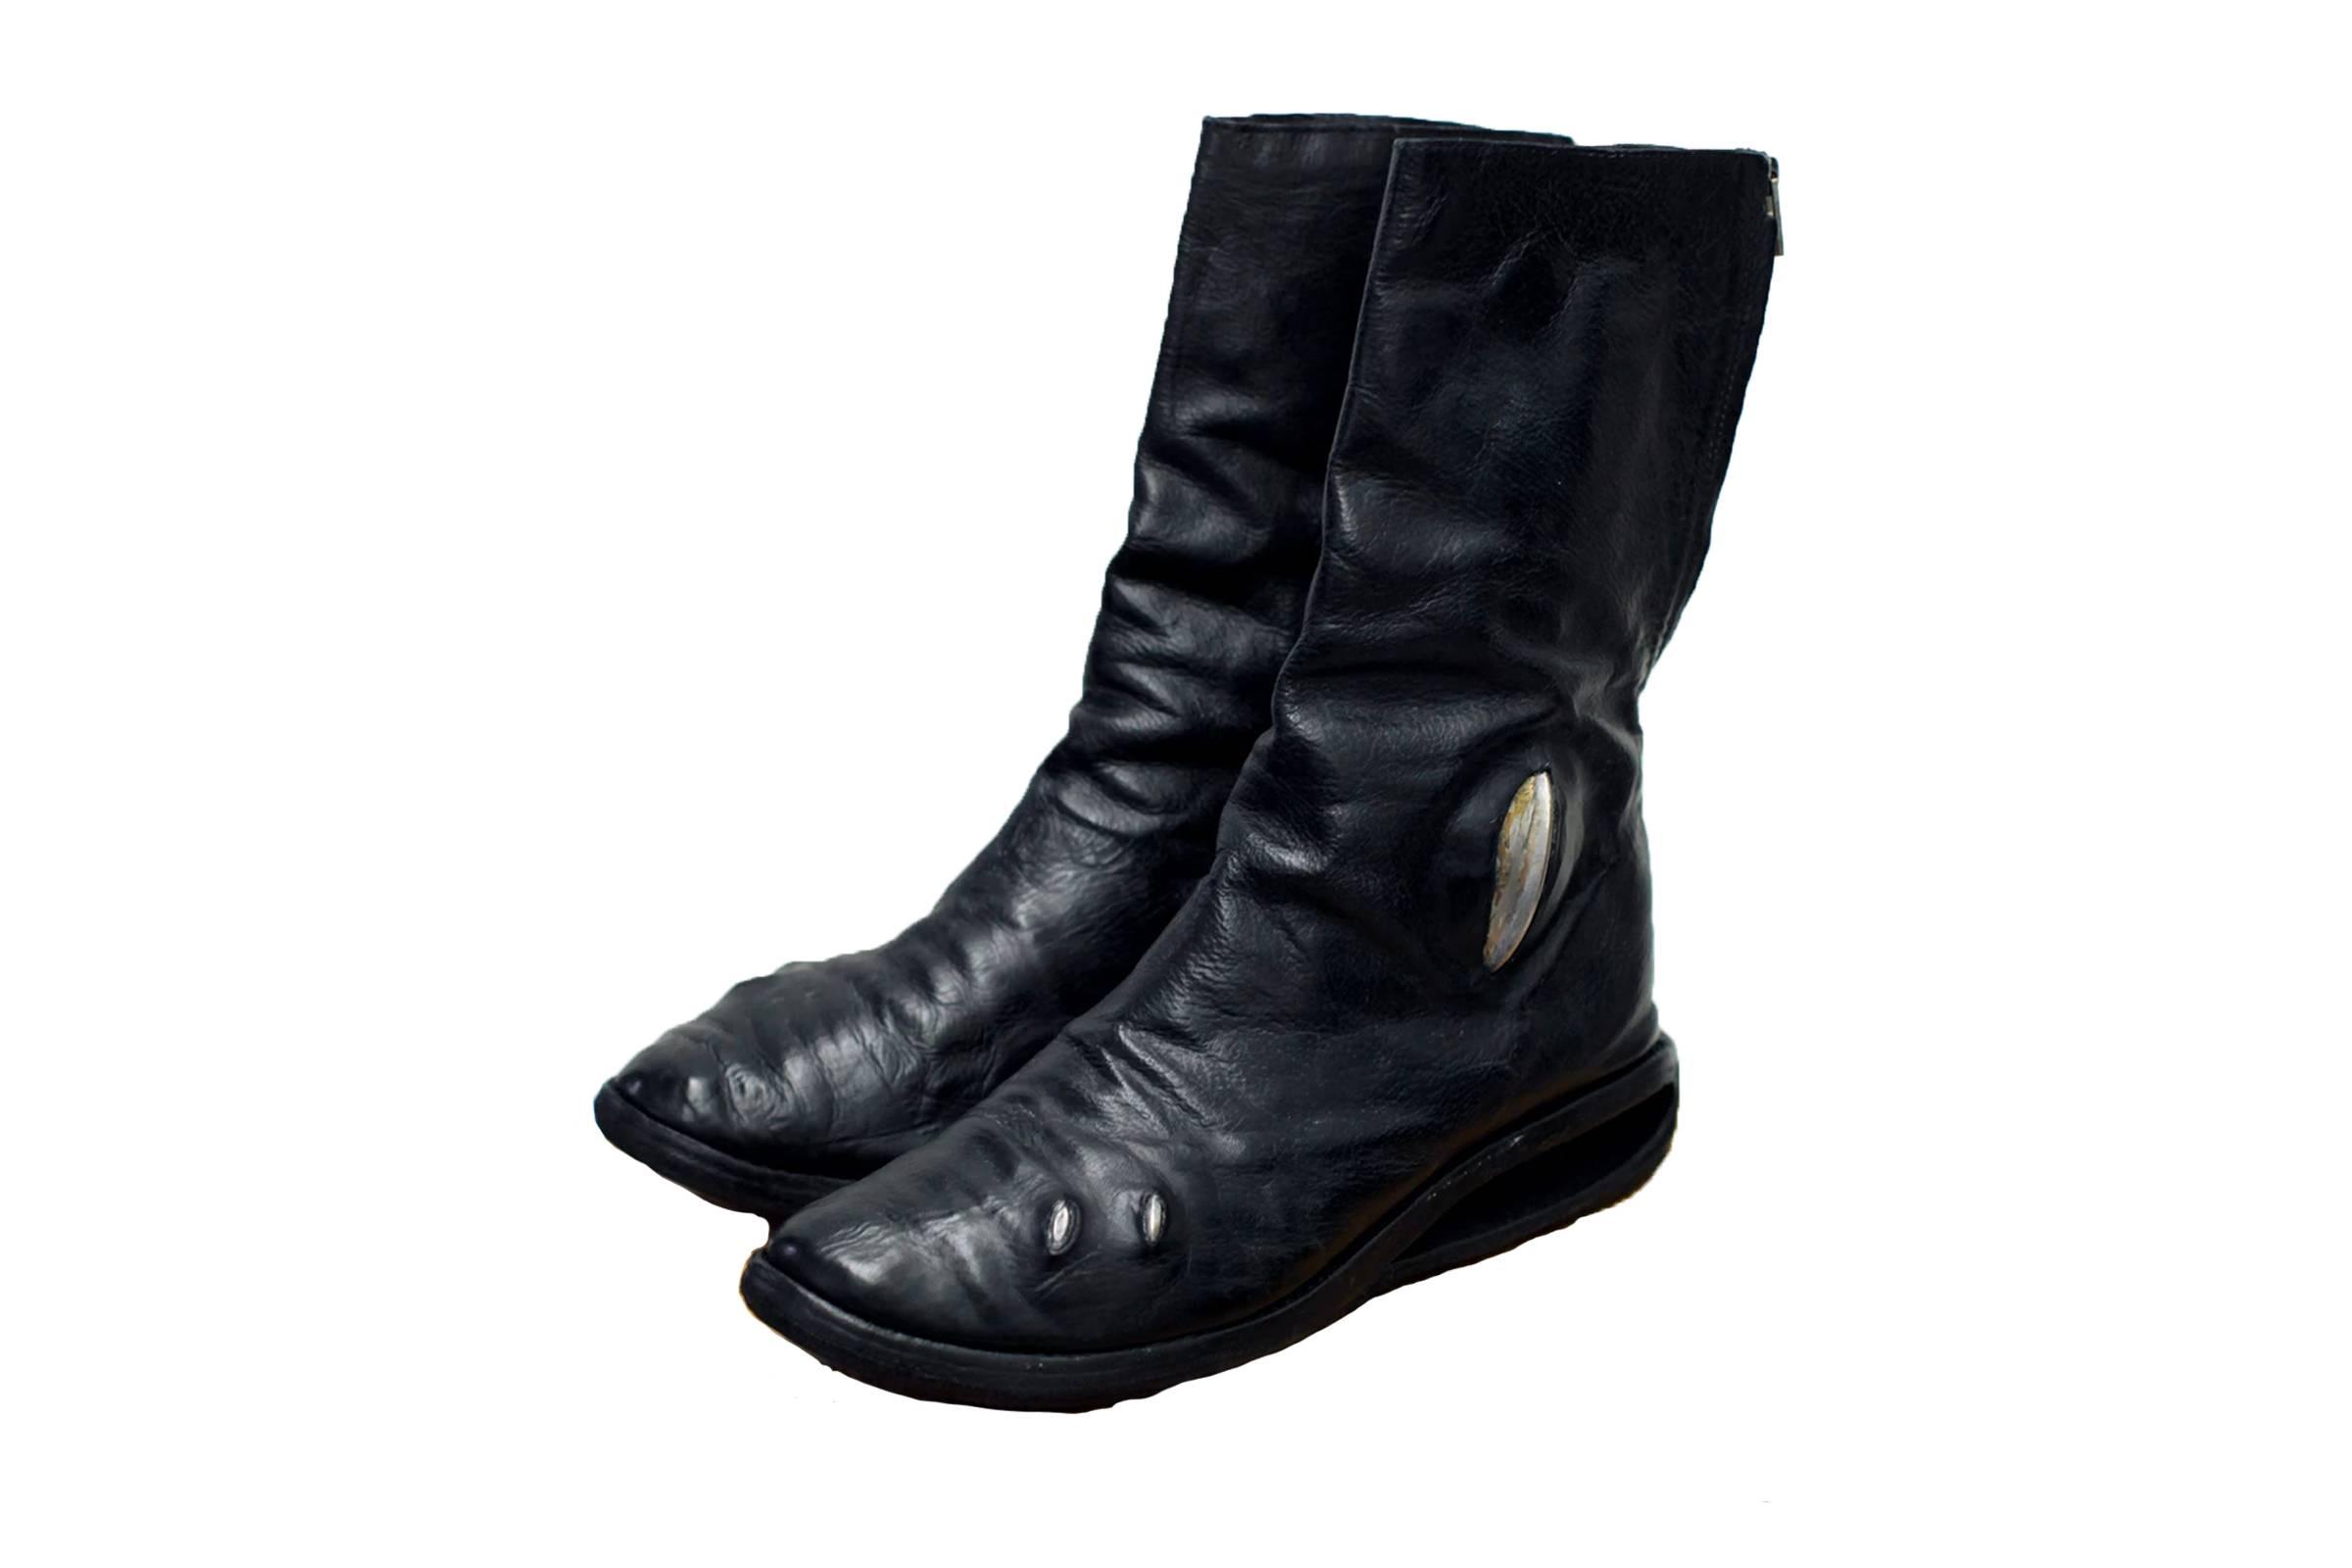 Carol Christian Poell Prosthetic U-Sole Tornado Boots